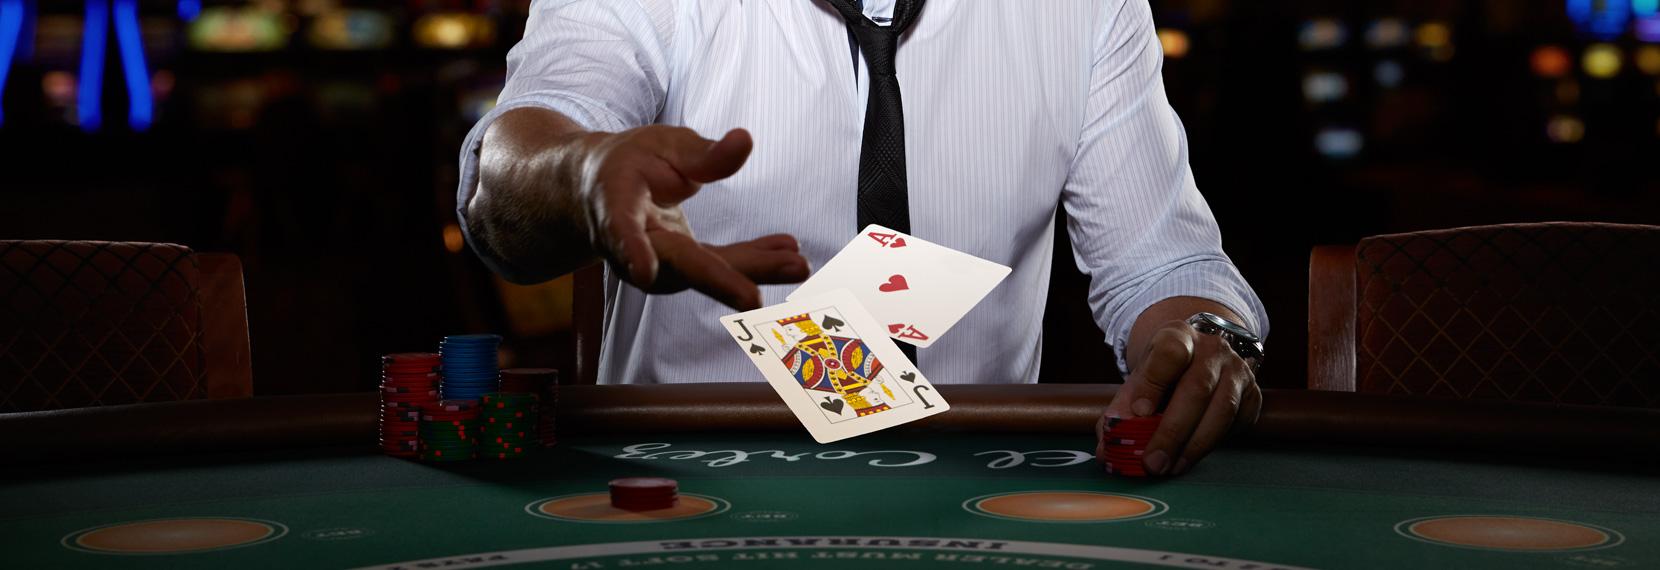 Give me fight blackjack 4sh